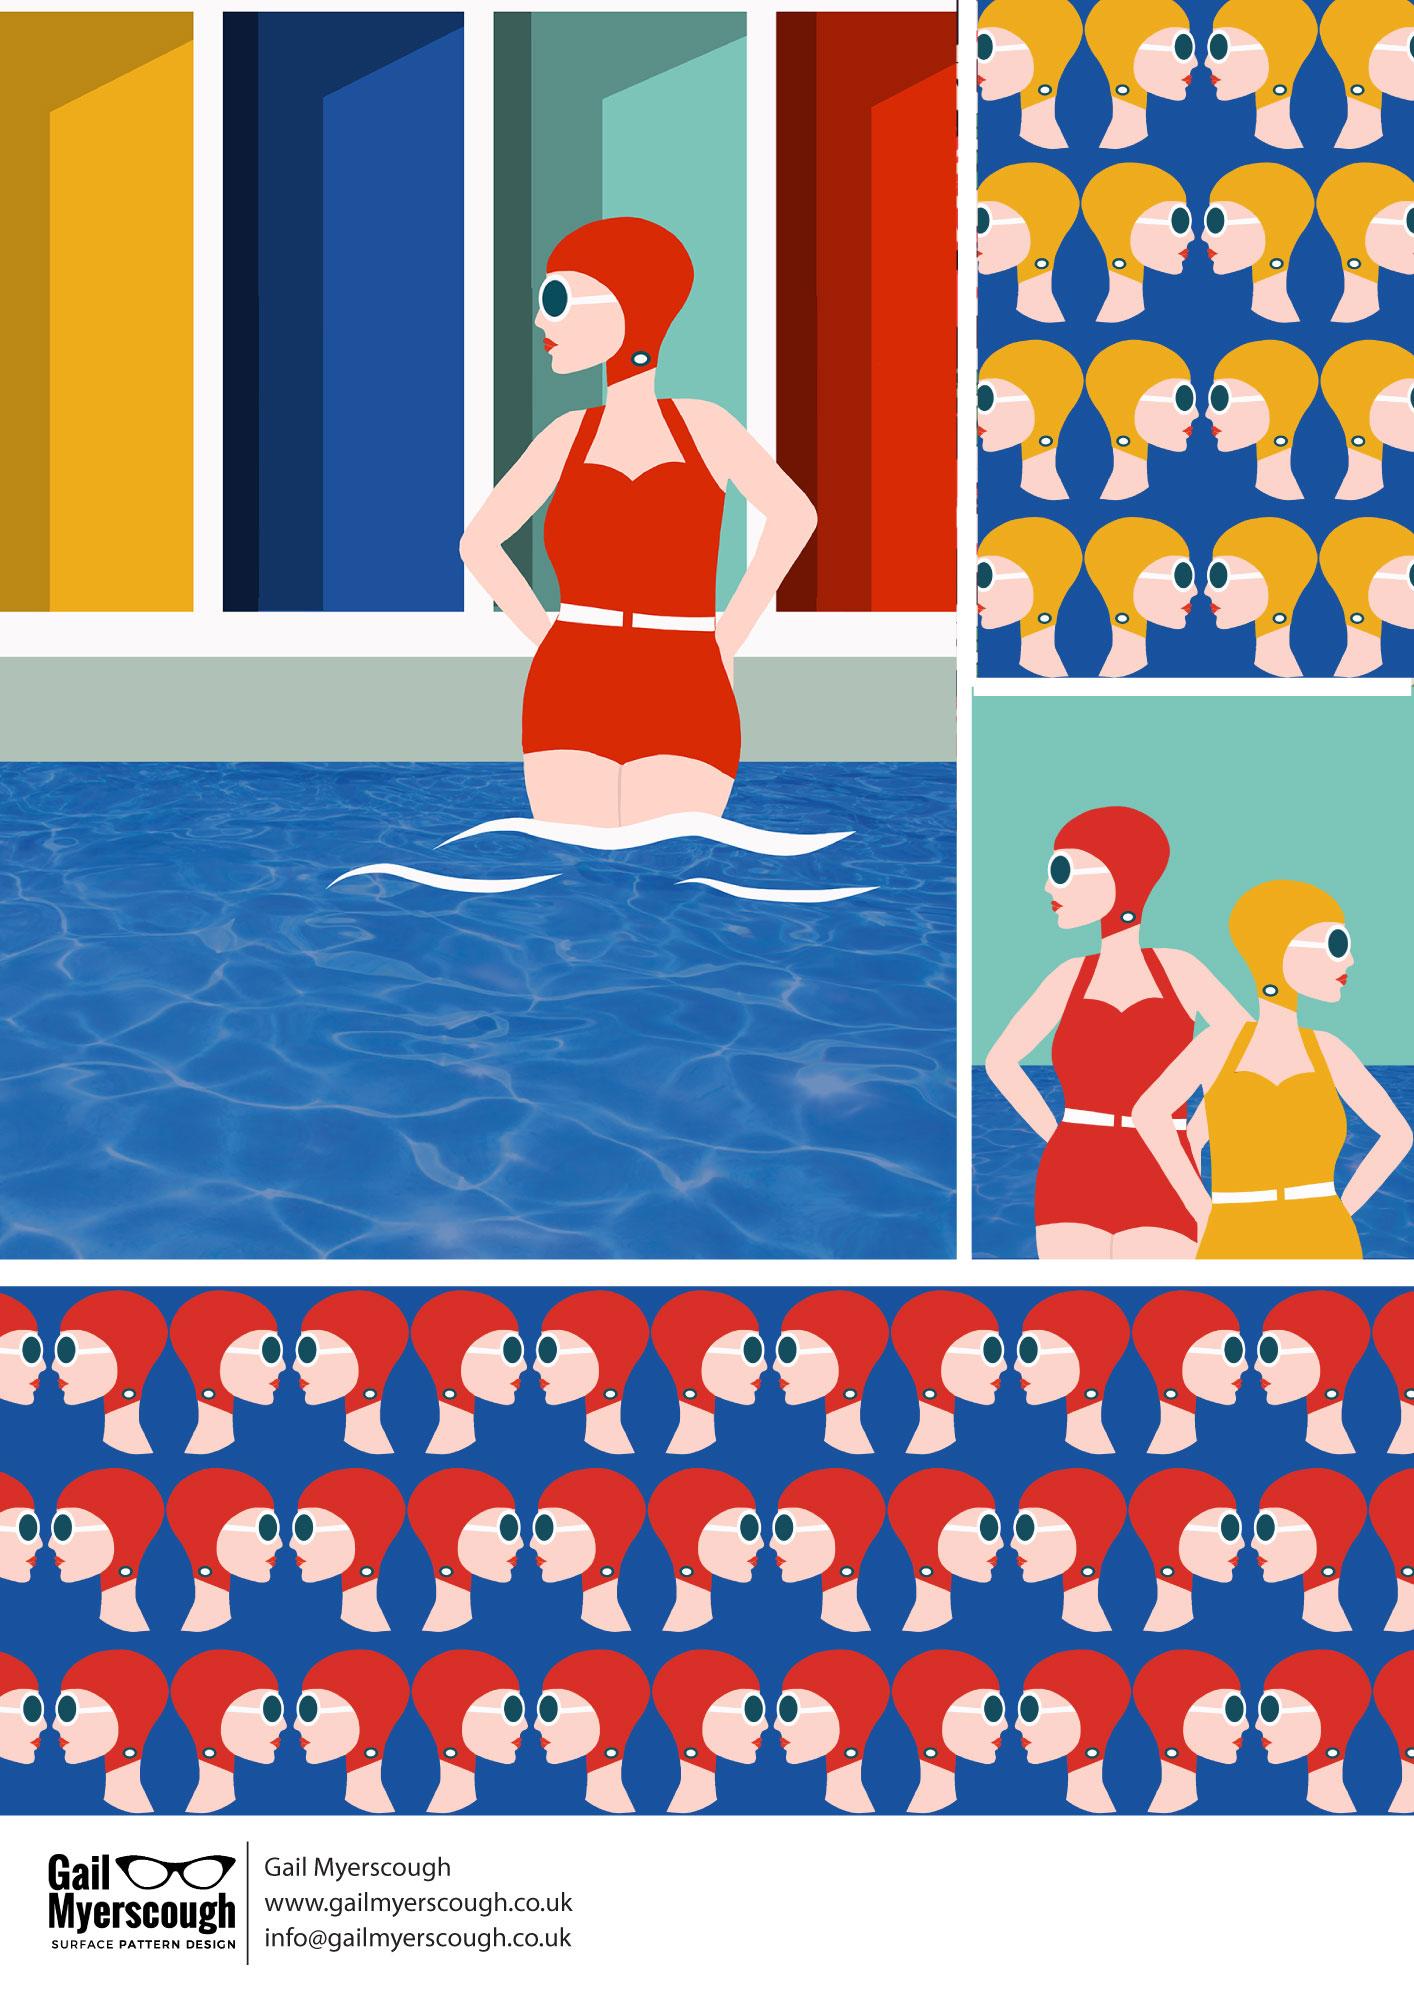 Gail-Myerscough-Pool-Party-FFAW18.jpg